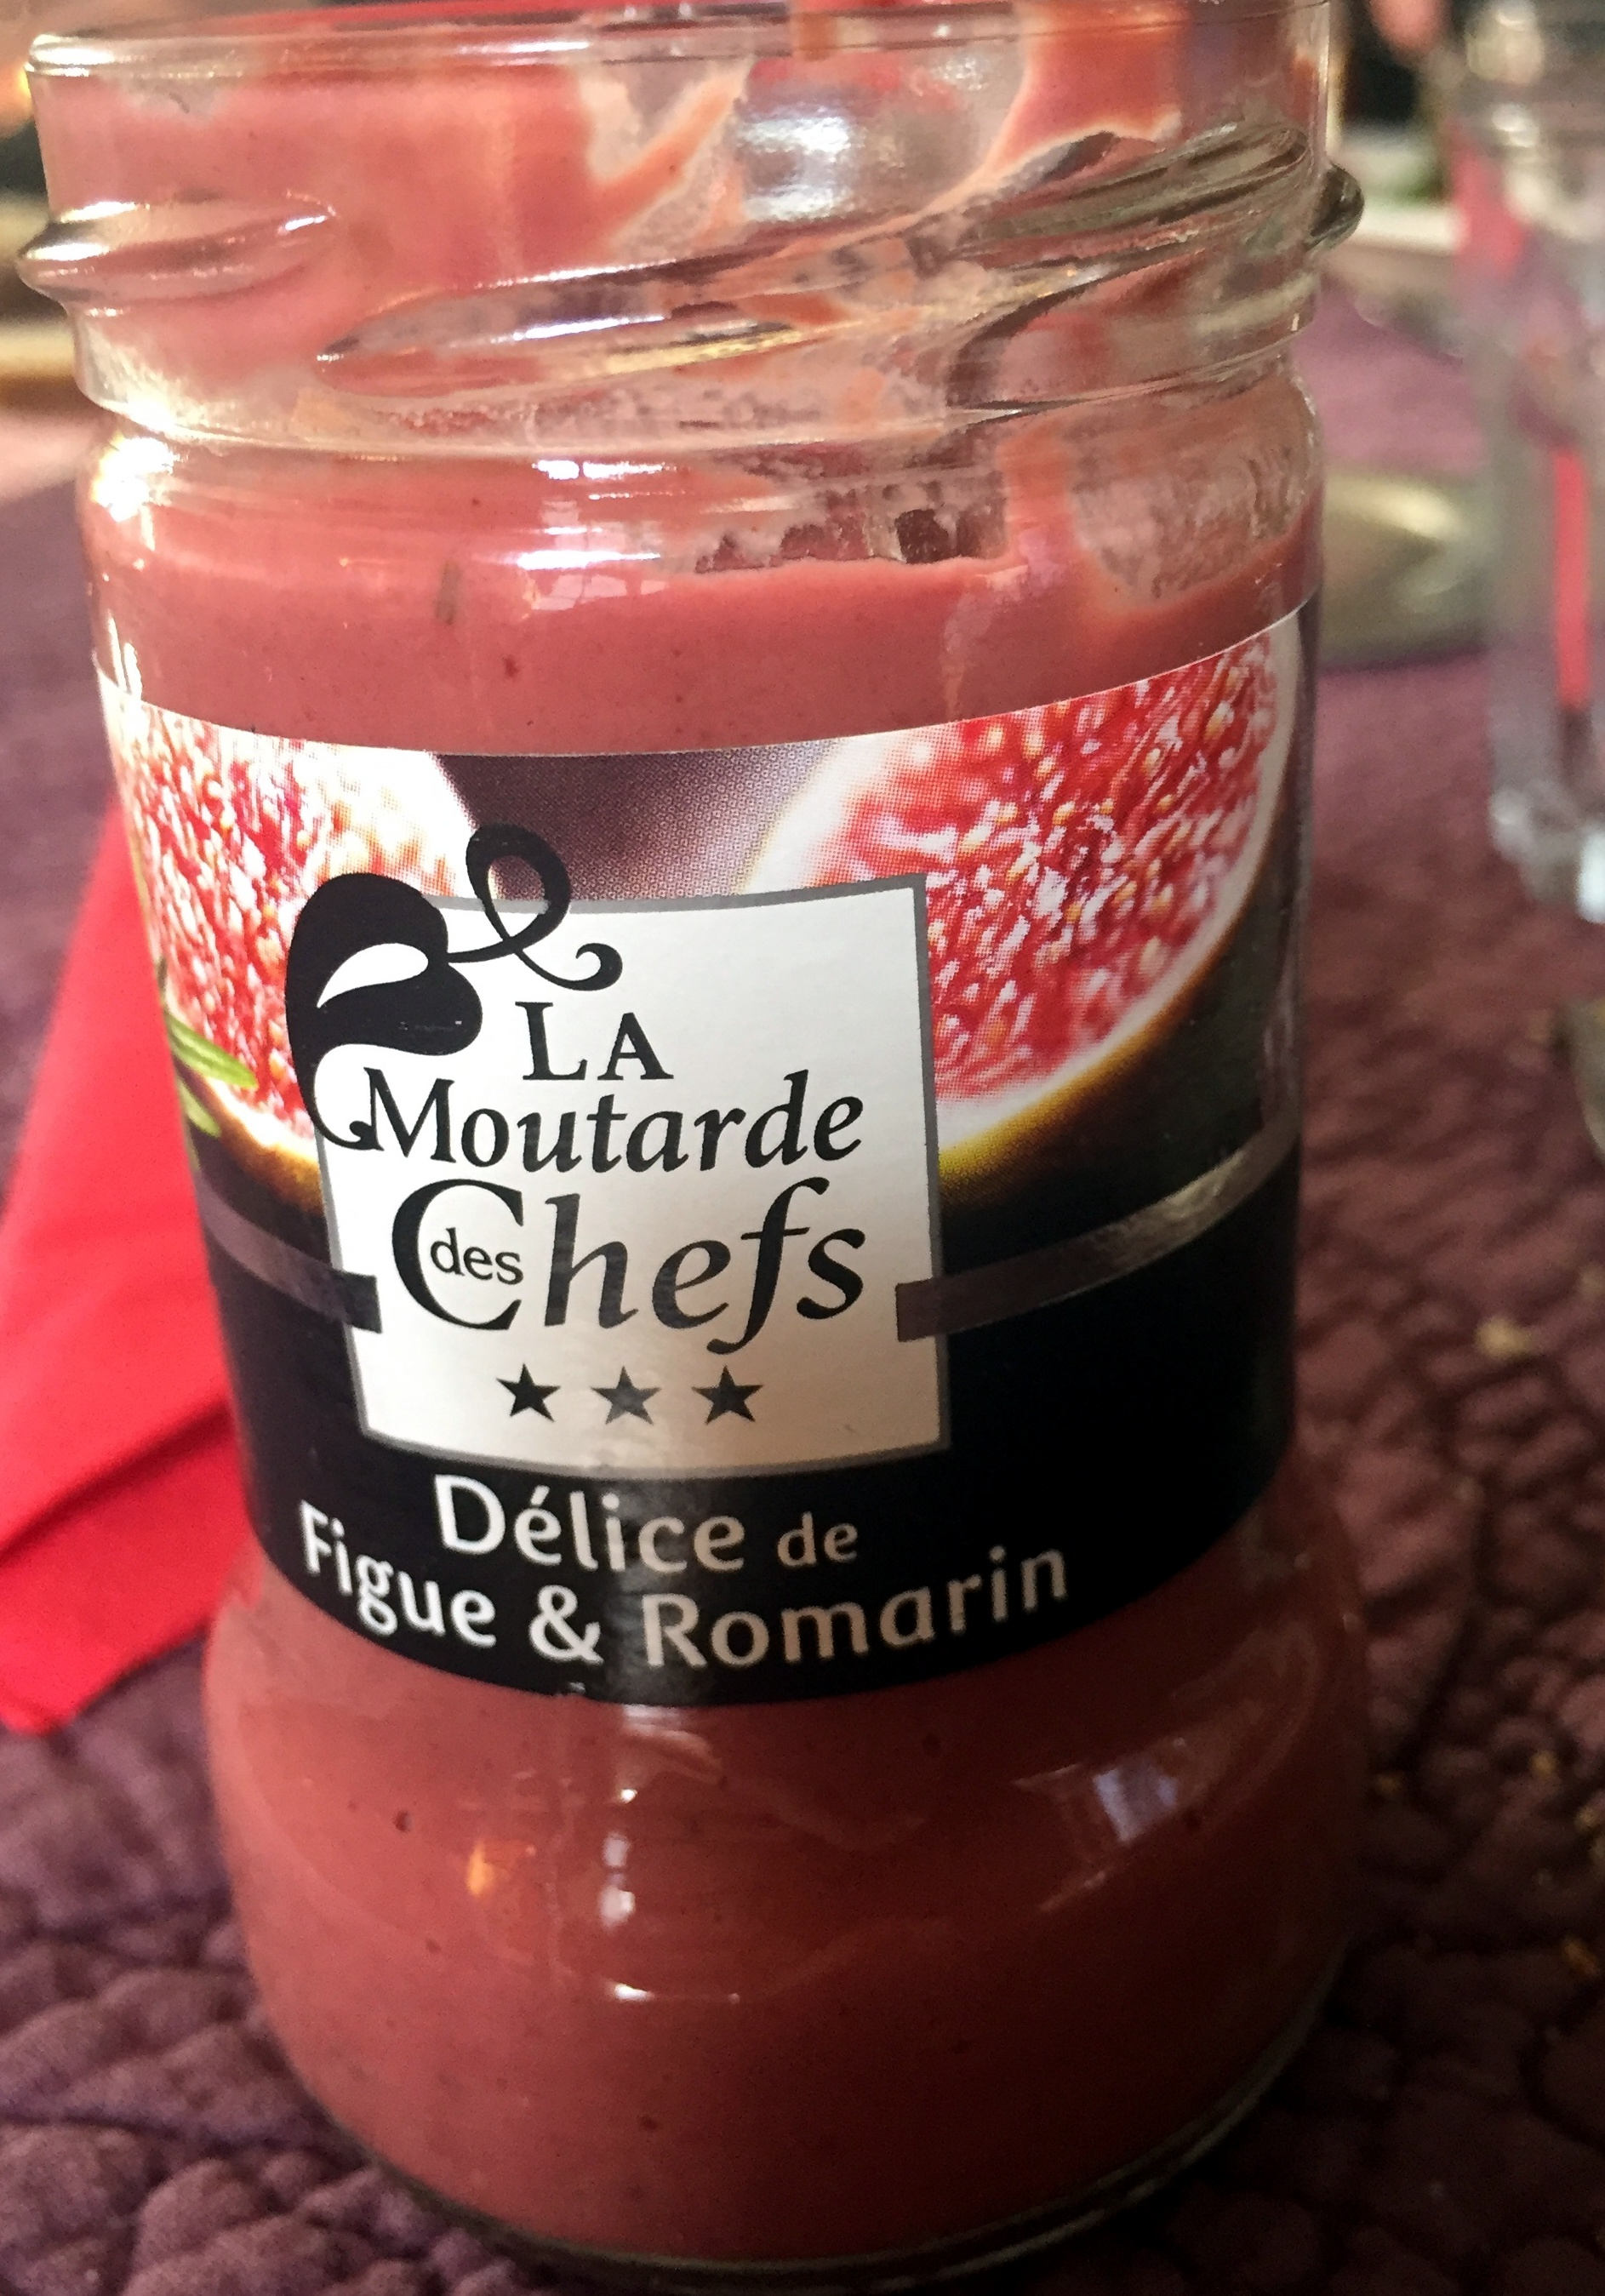 Moutarde figue & romarin - Produit - fr